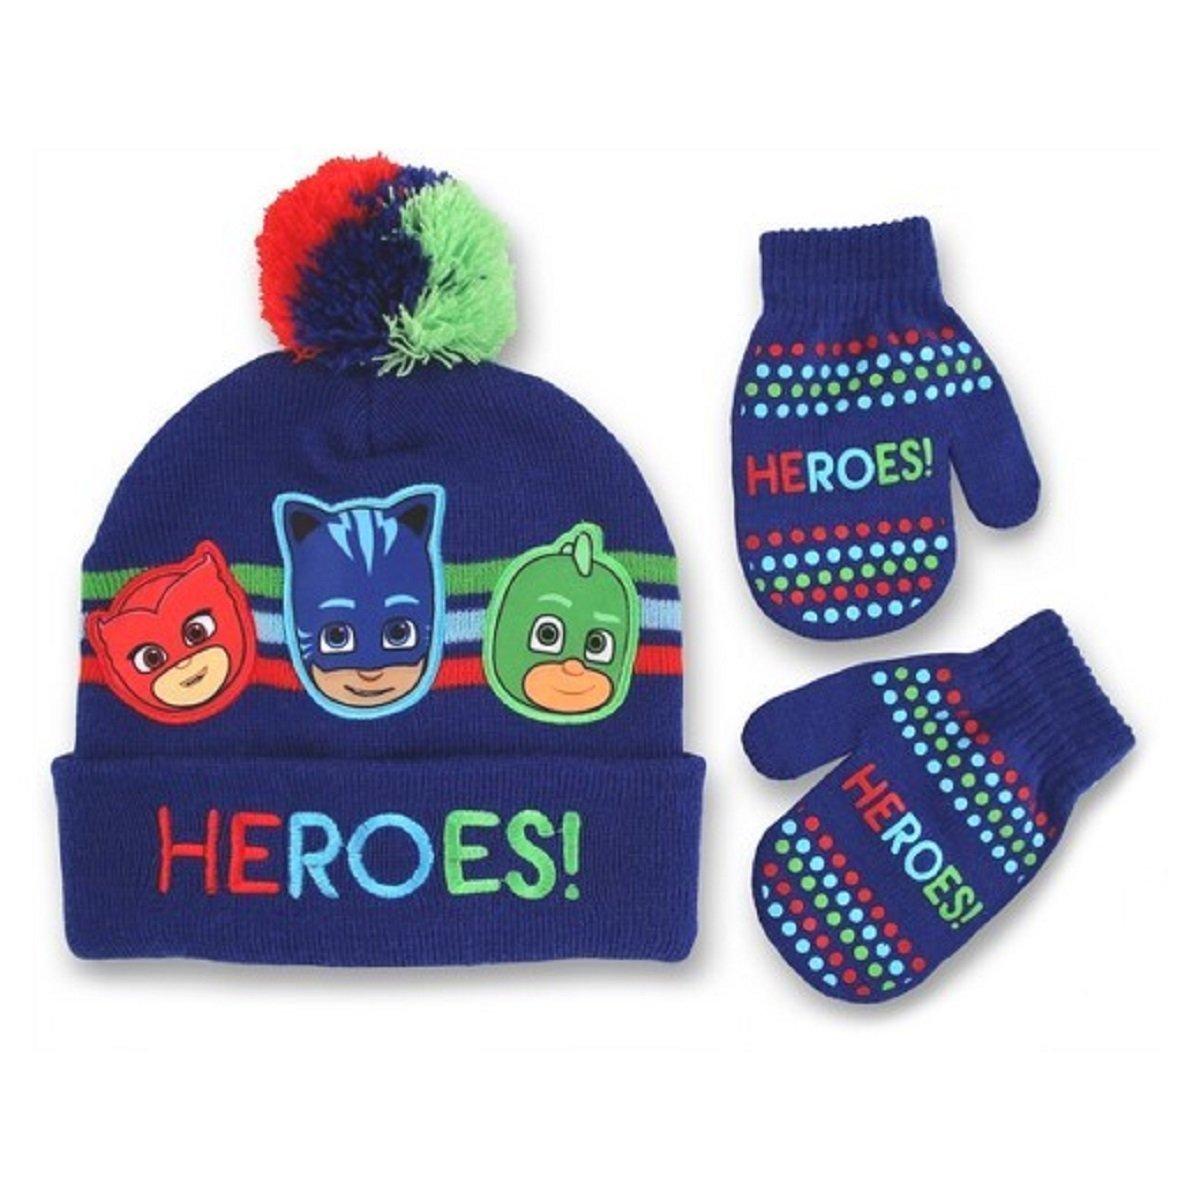 Winter Hat and Mitten Set Toddler Boys PJ Masks HEROS